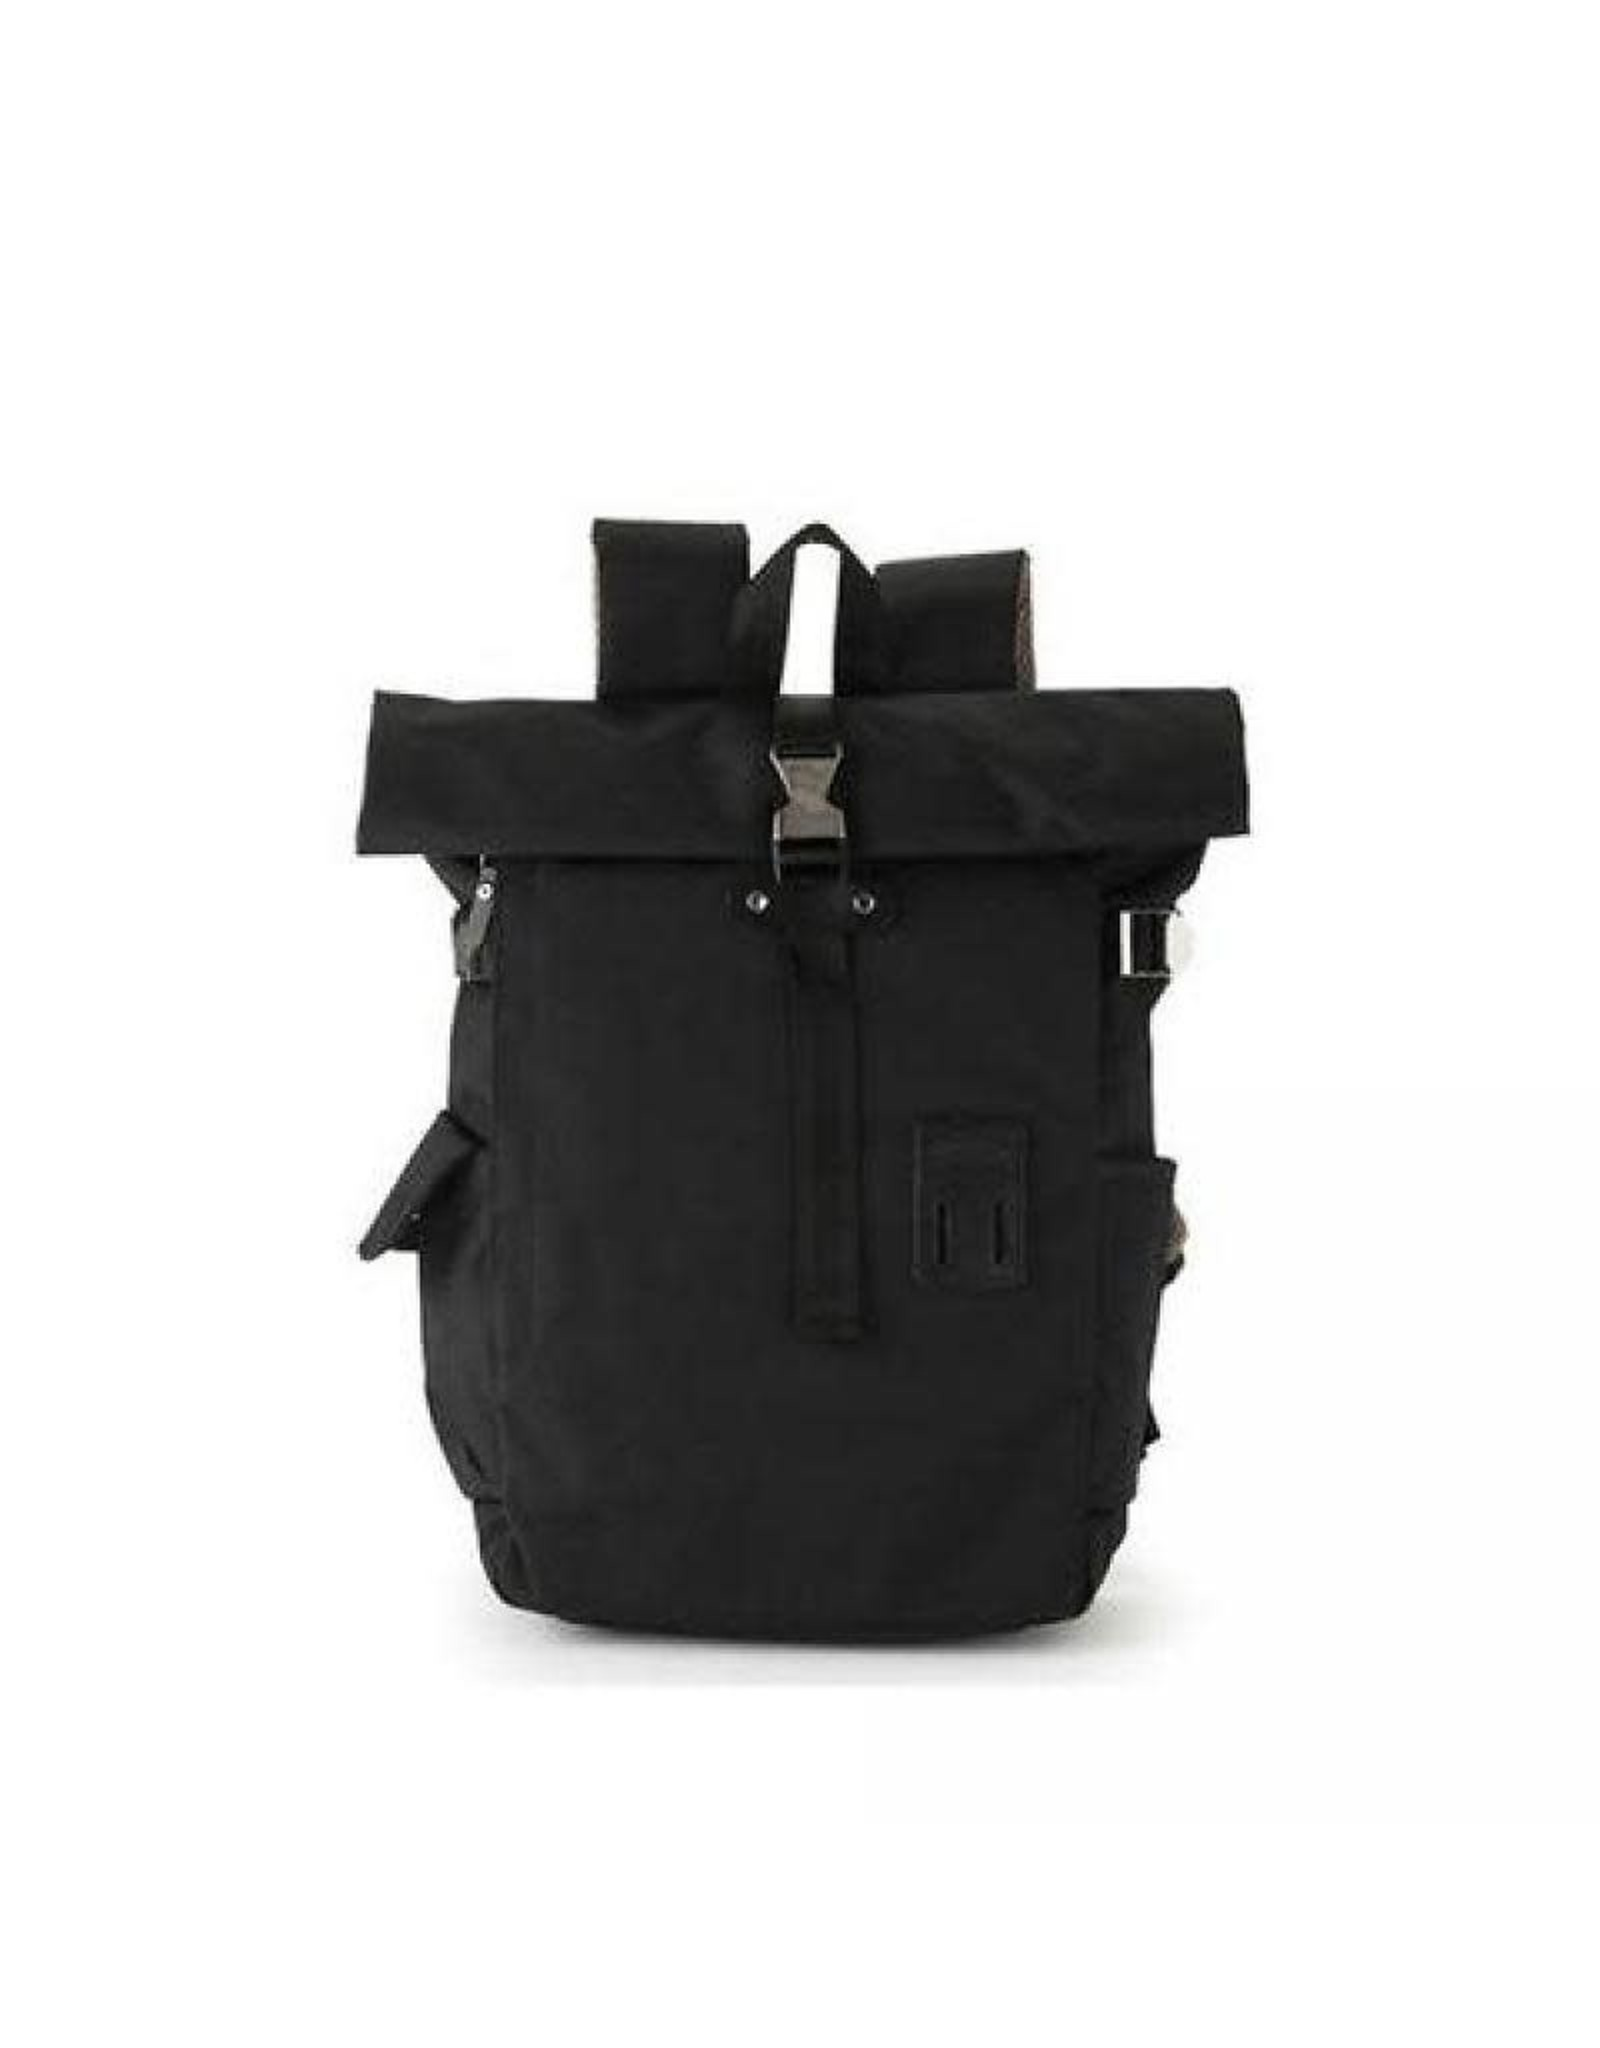 Rolltop Backpack 2.0 -